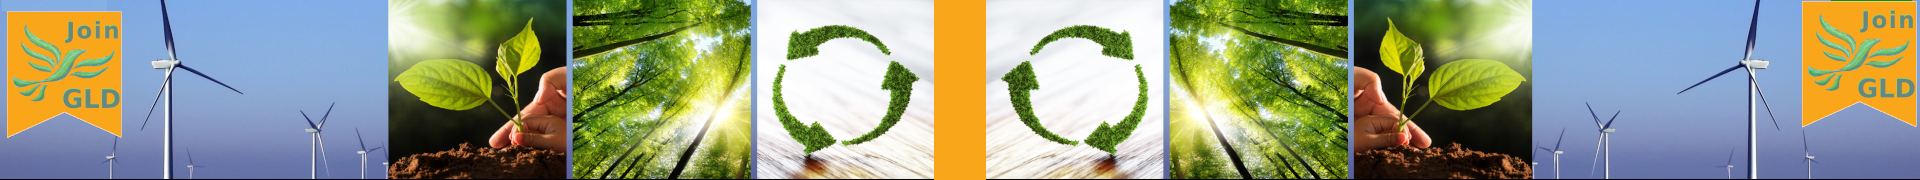 GLD banner 20200424 (greenlibdems.org.uk)